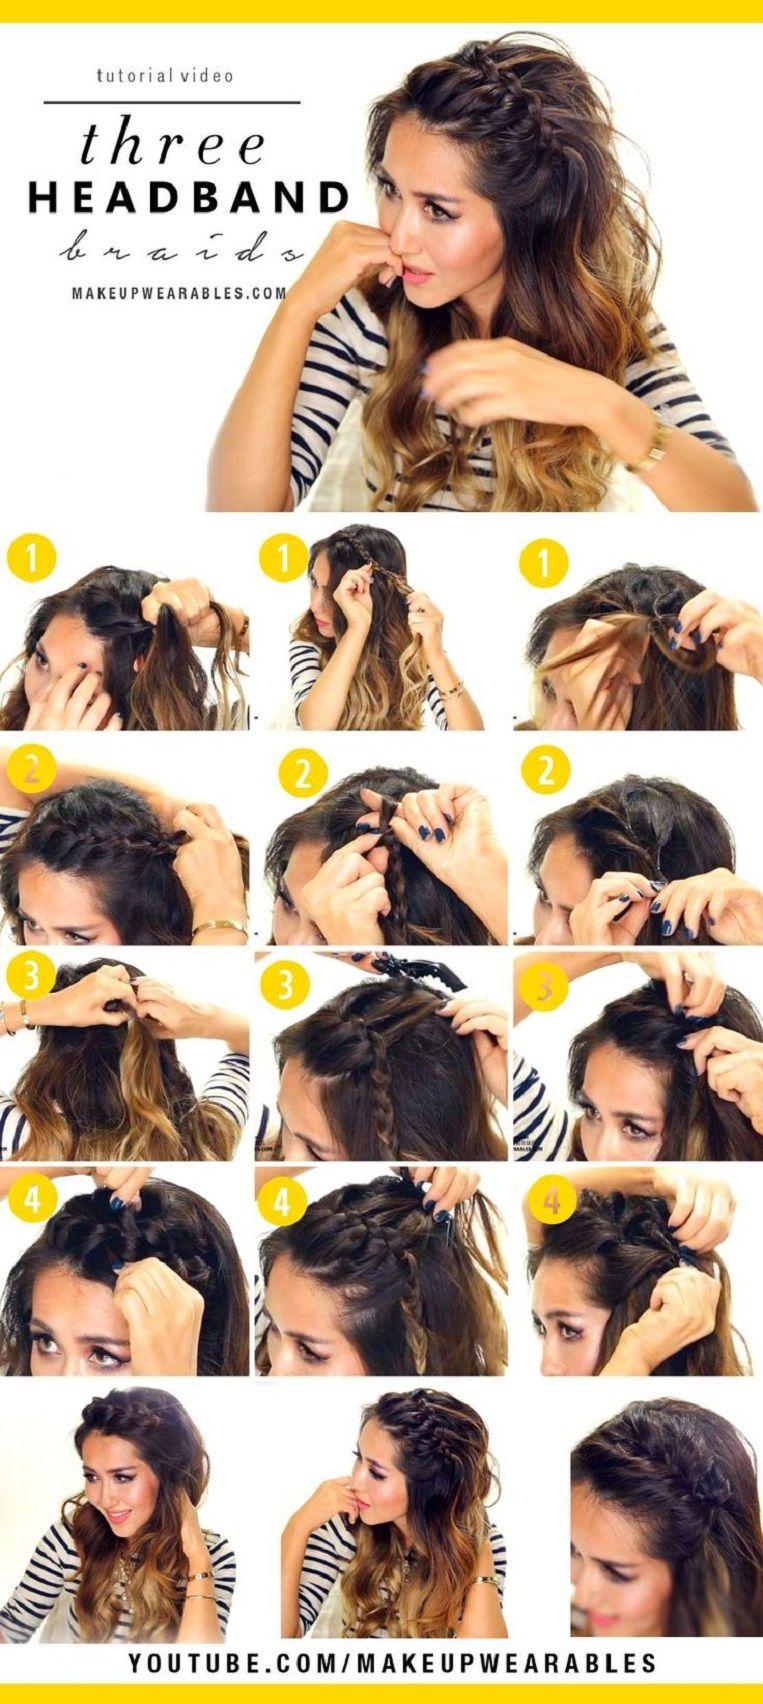 Cute braided hair tutorial party perfect beauty tutorials that